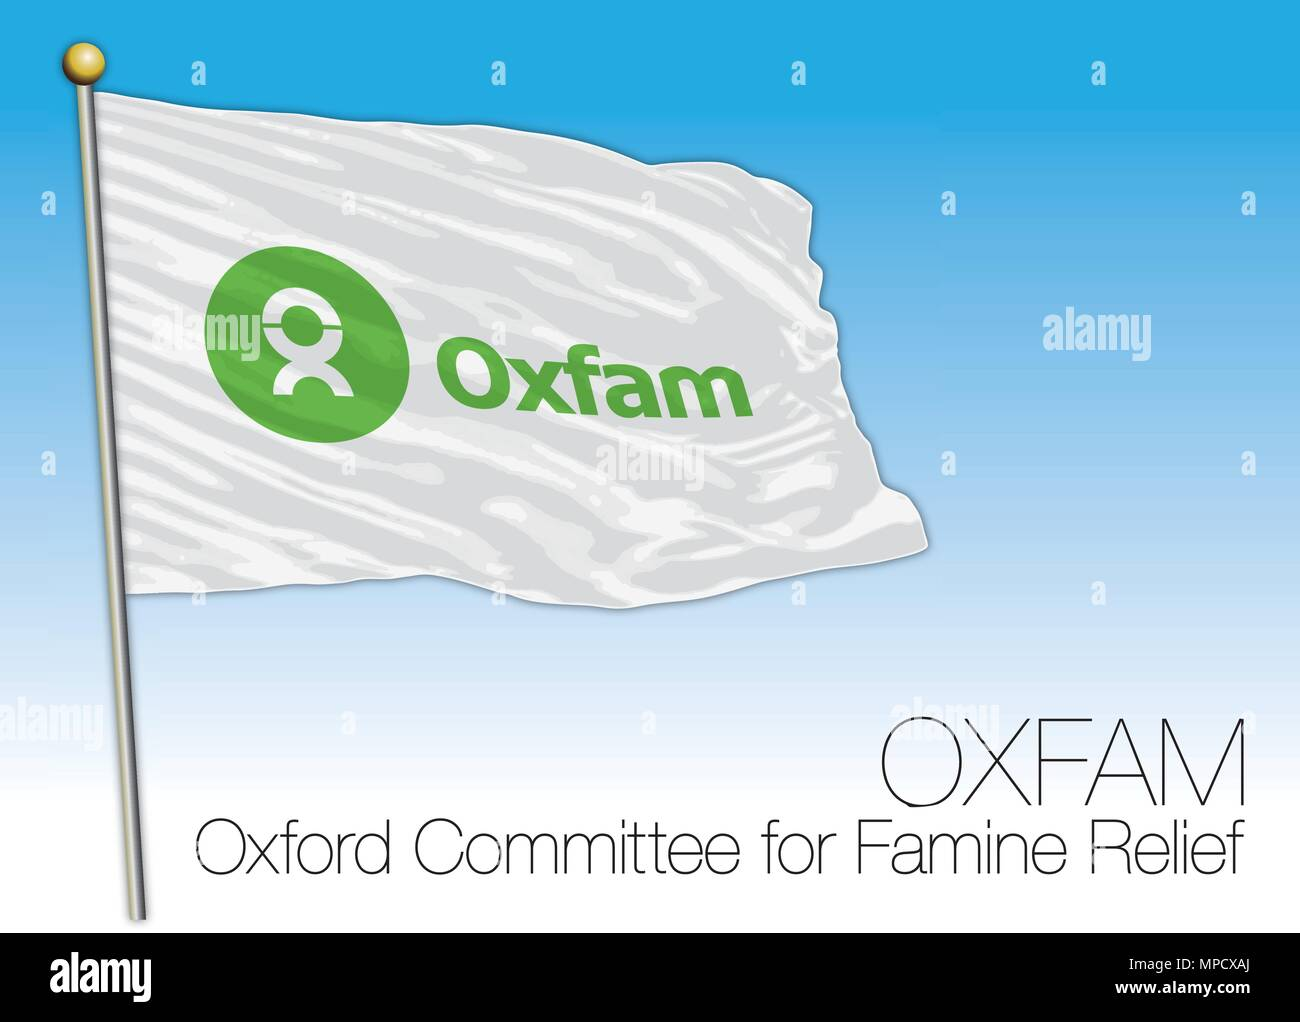 is oxfam a non profit organisation